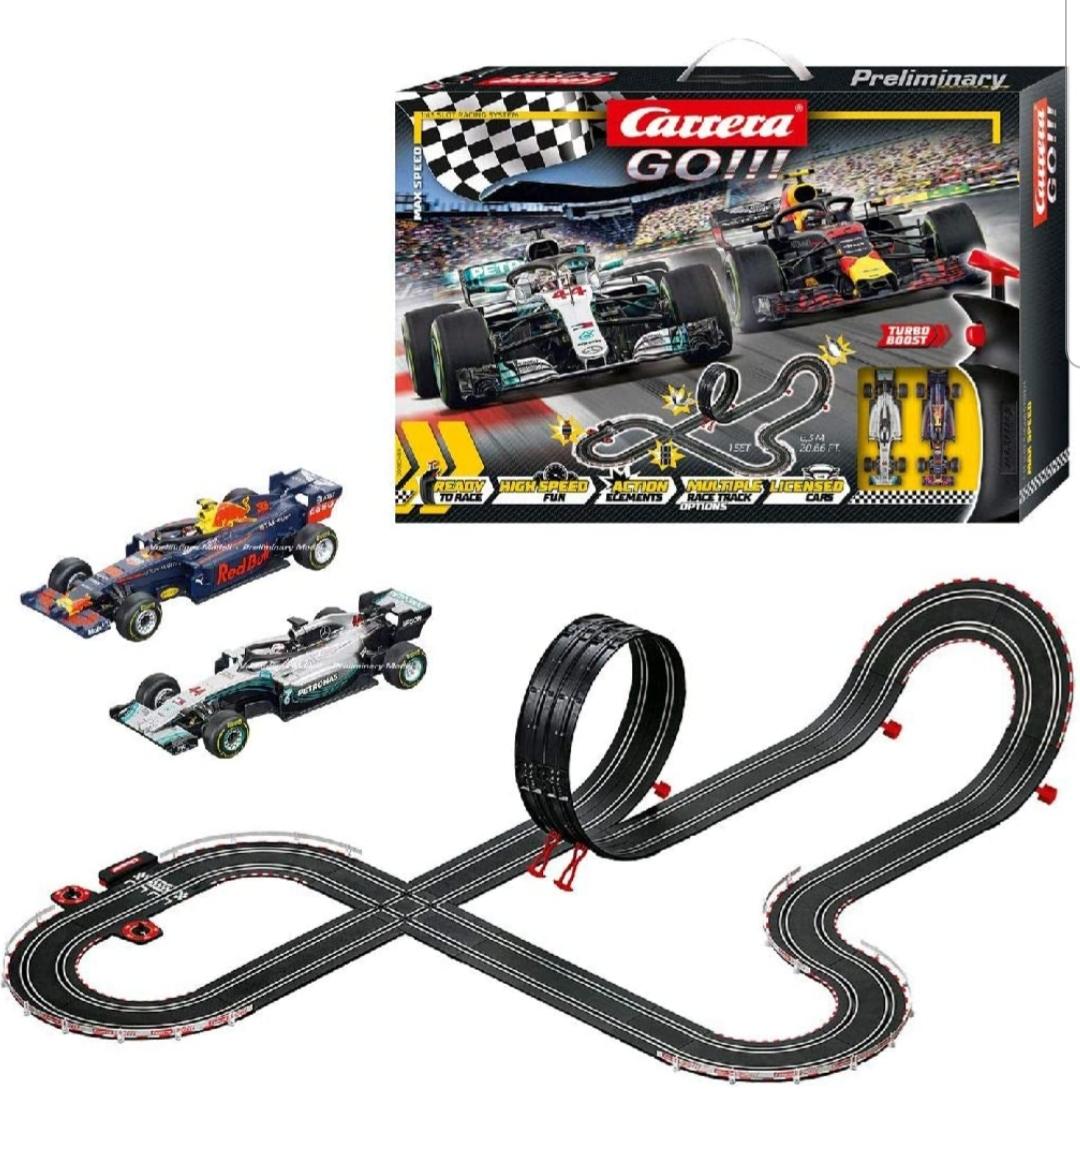 Carrera Go Max Speed 52,10 bij Amazon.nl